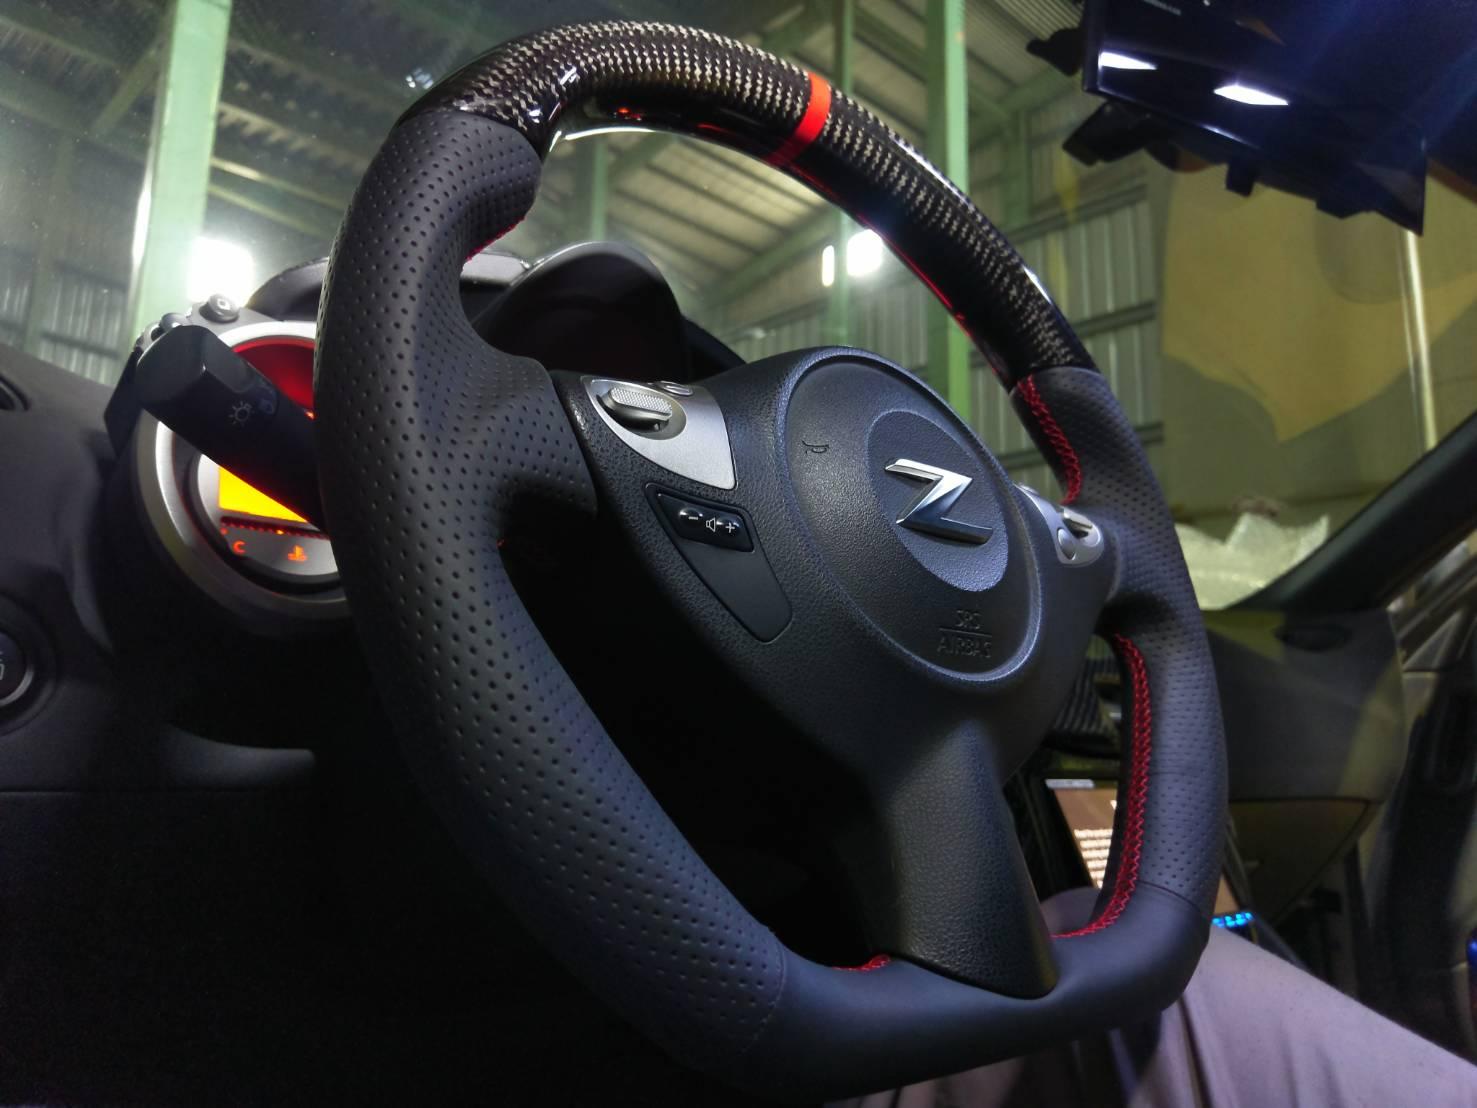 evo r 370z oem carbon leather d shape steering wheel nissan 370z forum nissan 370z forum